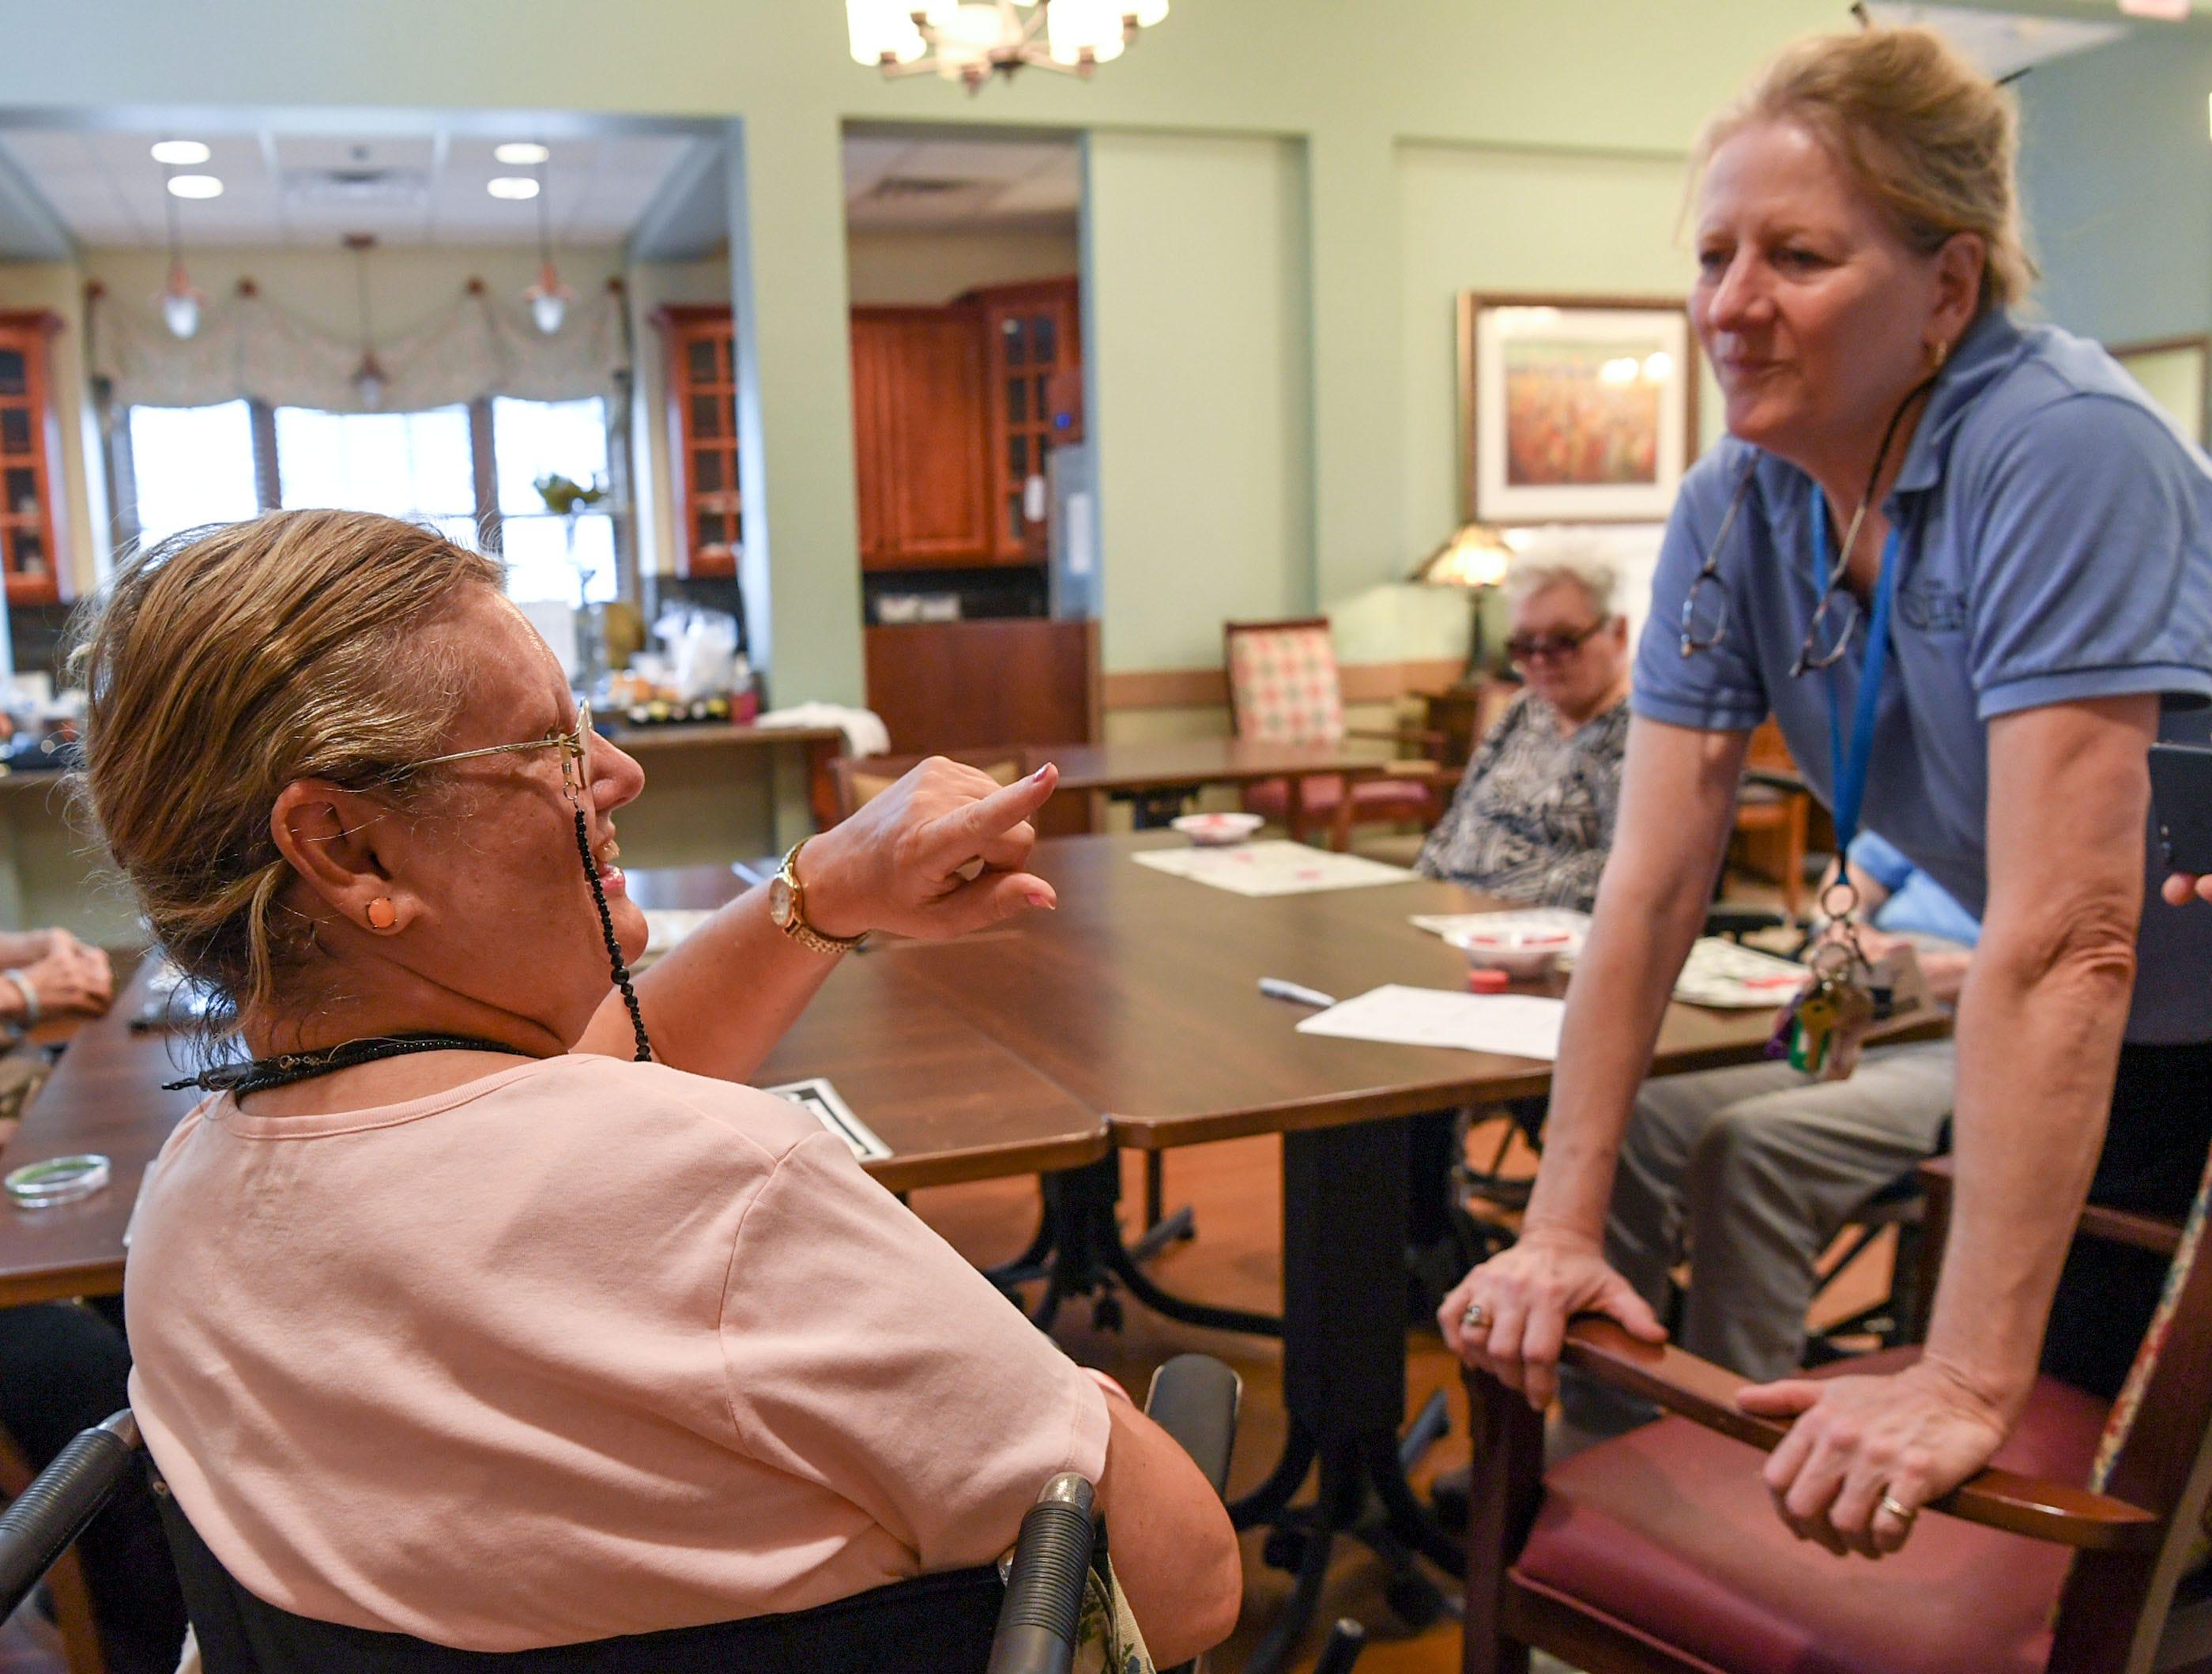 Laura Still, left, talks with Julie Rehder, spokeswoman at the Davis Community nursing home and assisted living facility in Wilmington, North Carolina on Thursday, September 13, 2018. (Ken Ruinard / Greenville News / Gannett USA Today Network / 2018 )